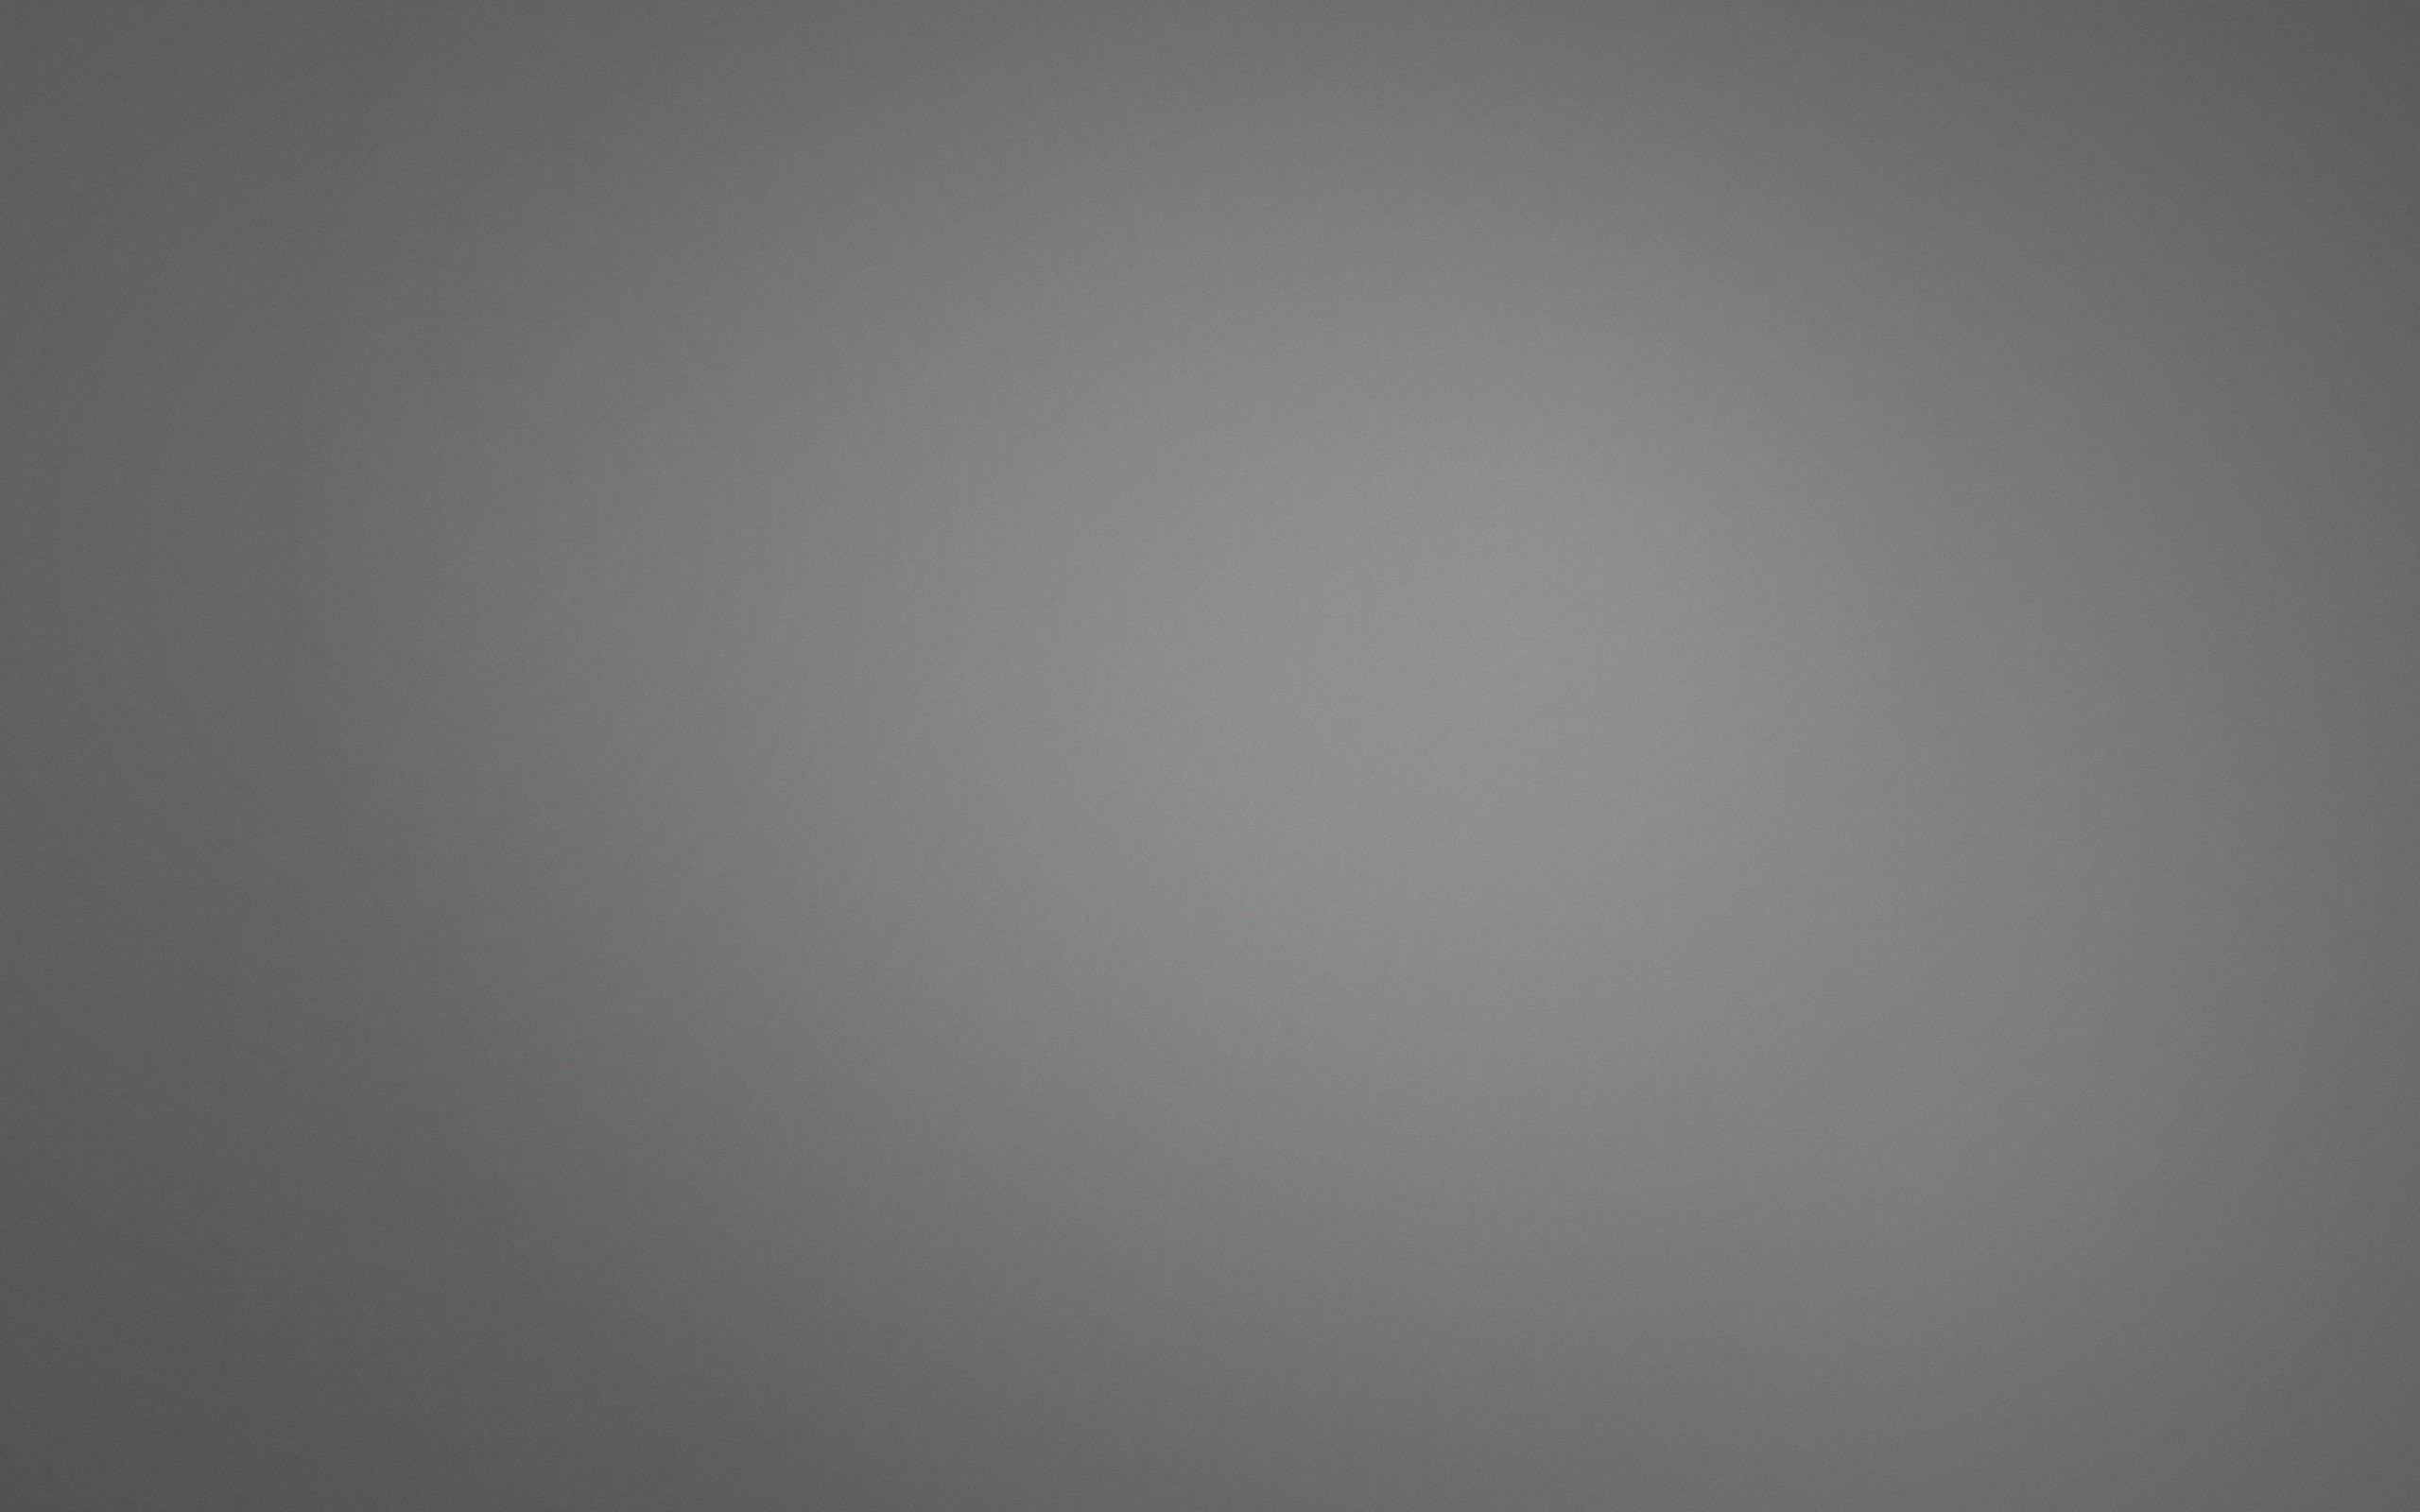 clean grey bg 2560 x 1600markwester on deviantart